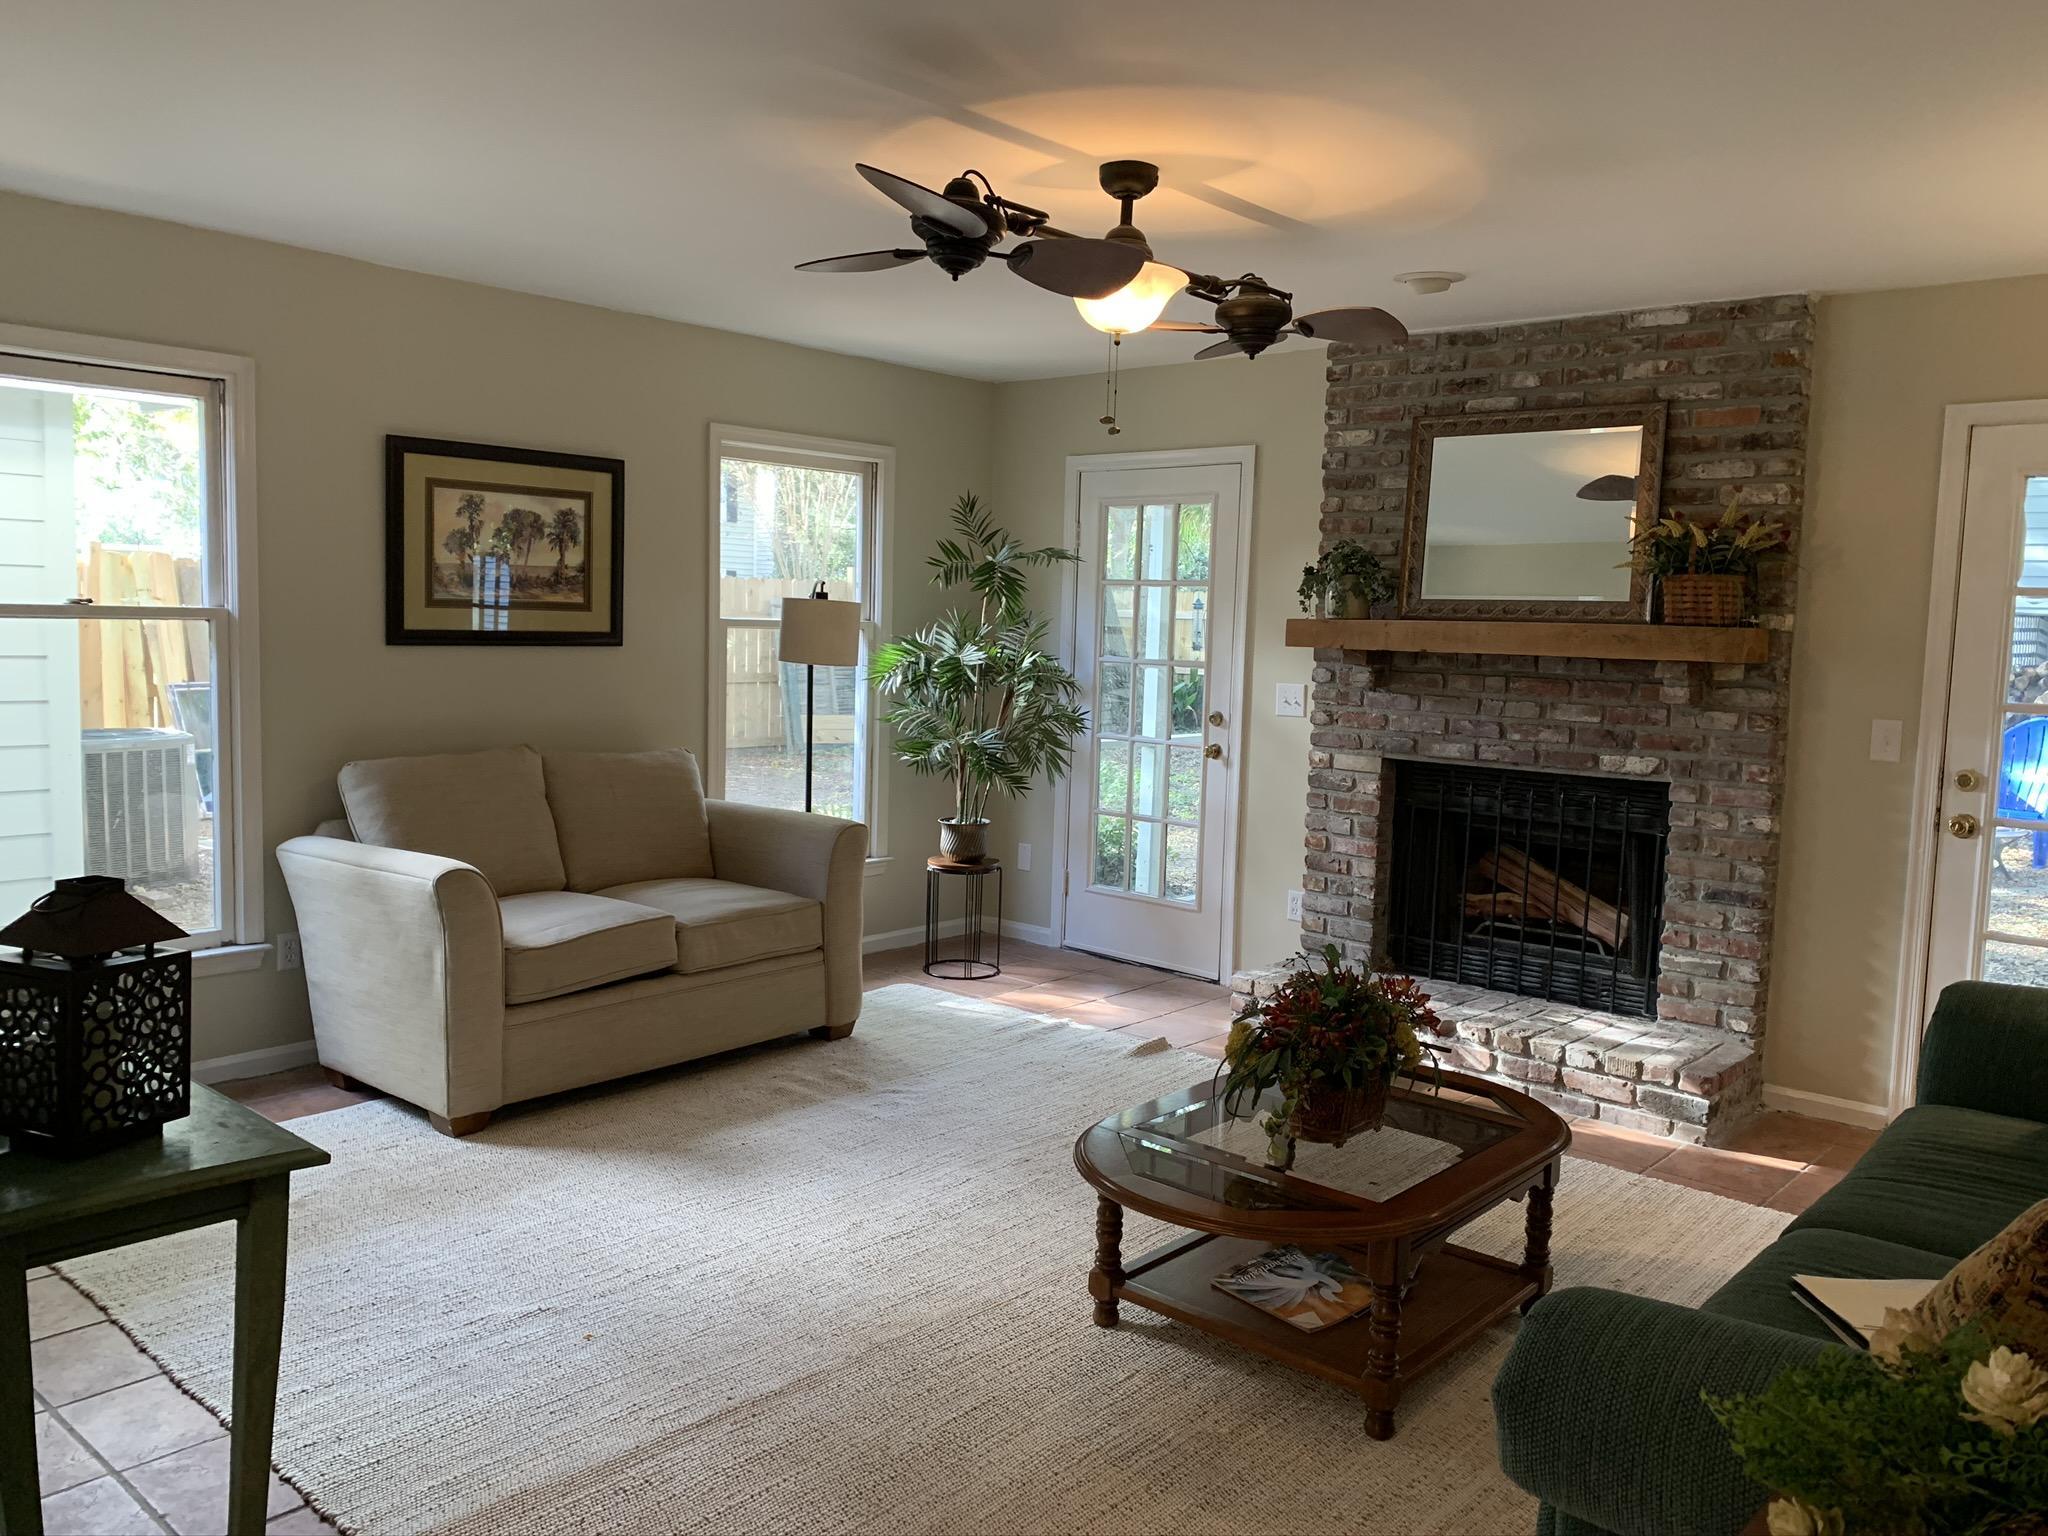 Fox Pond Homes For Sale - 662 Poaug, Mount Pleasant, SC - 8